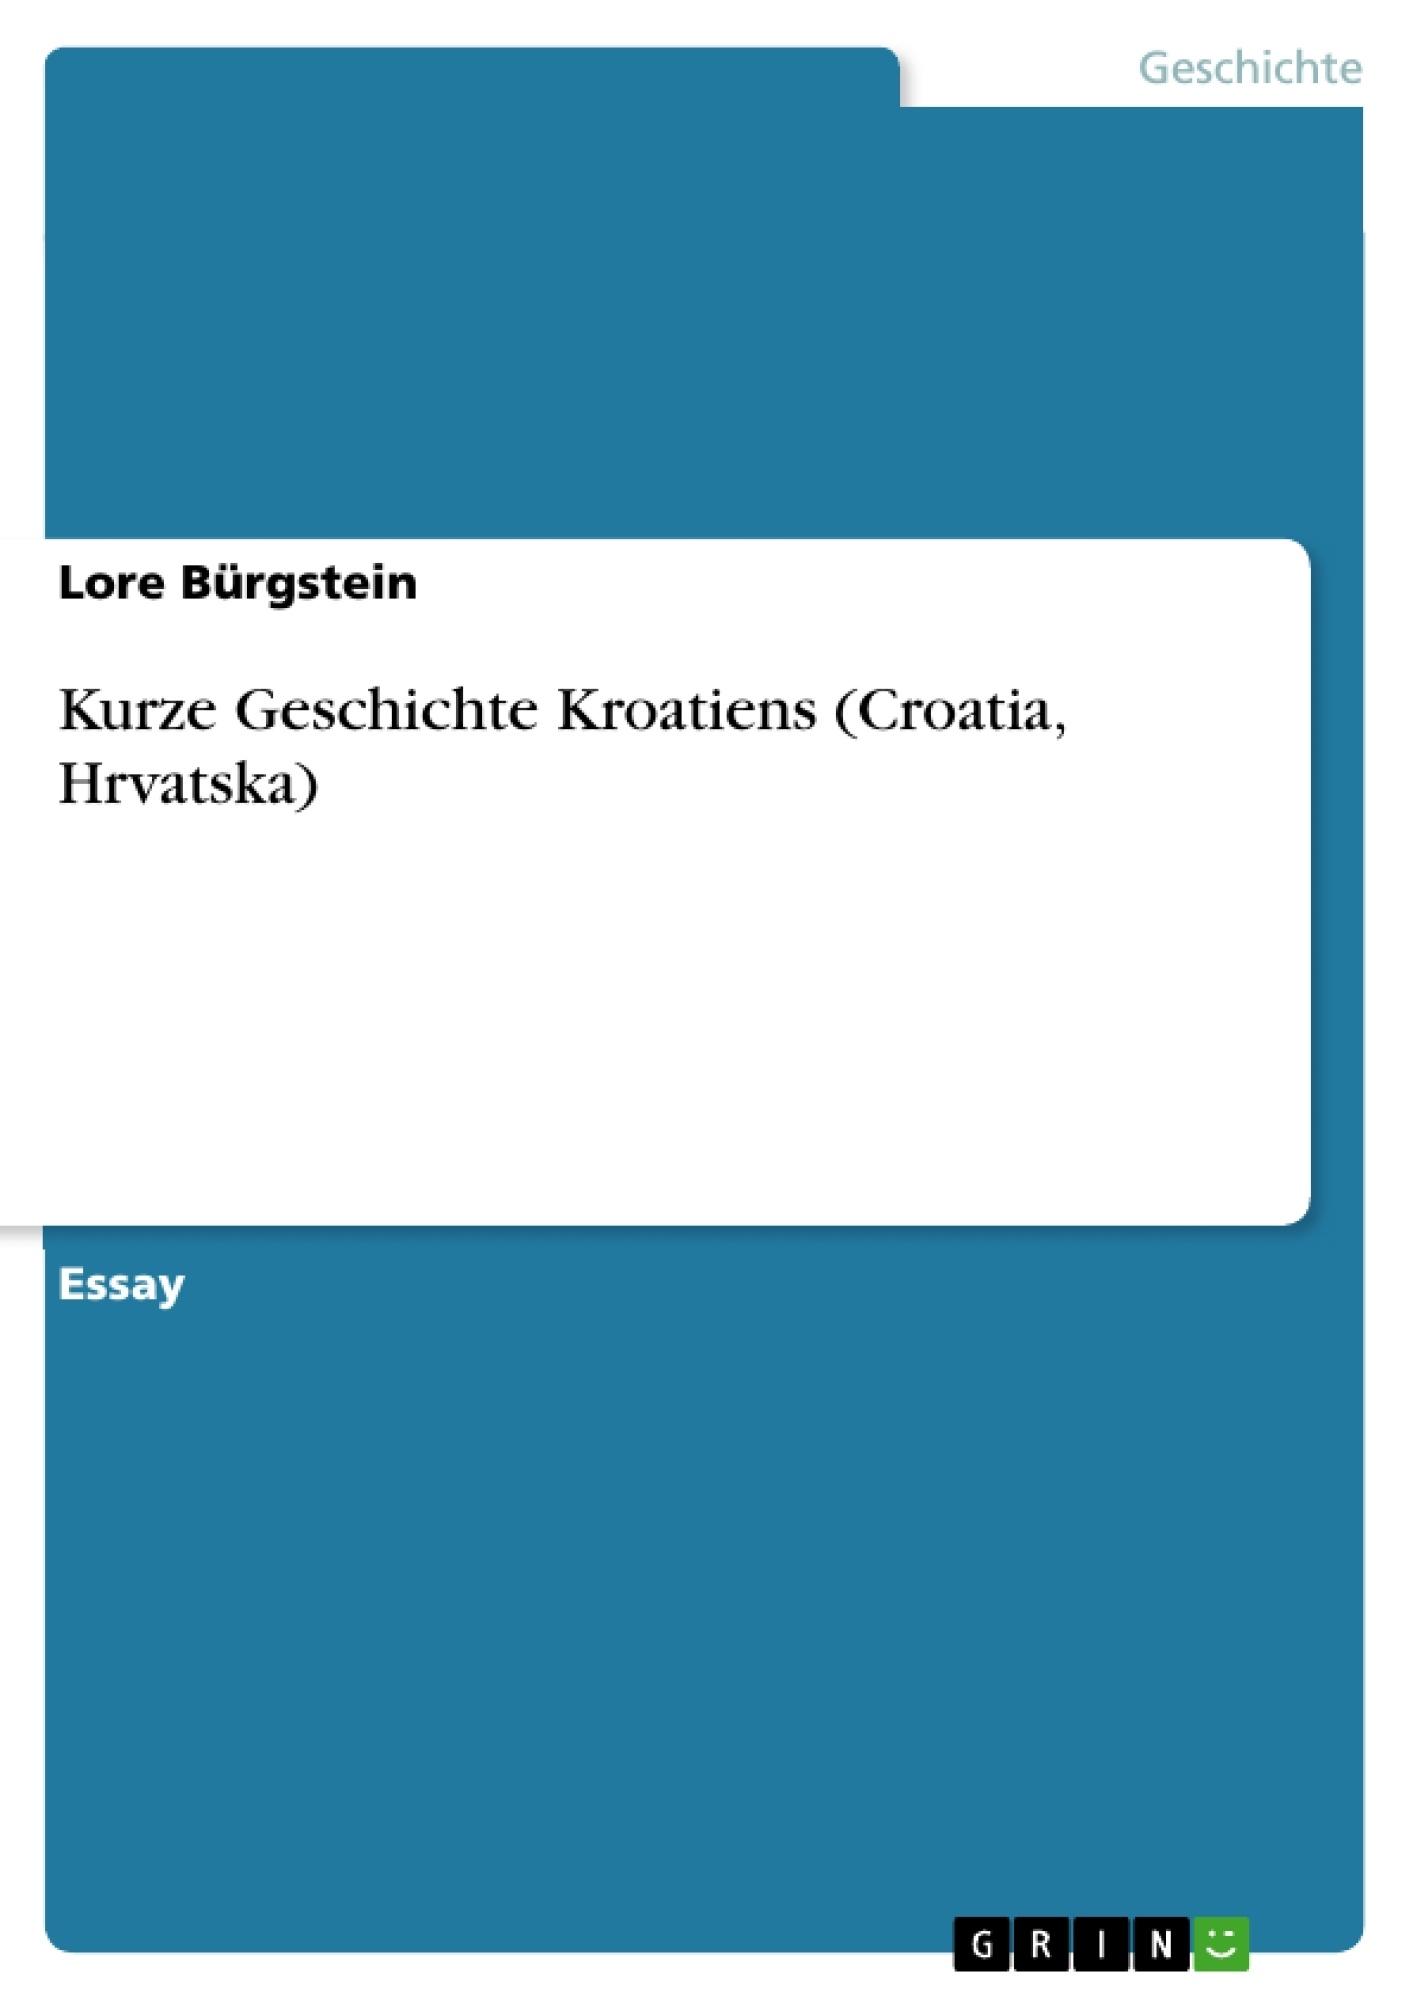 Titel: Kurze Geschichte Kroatiens (Croatia, Hrvatska)